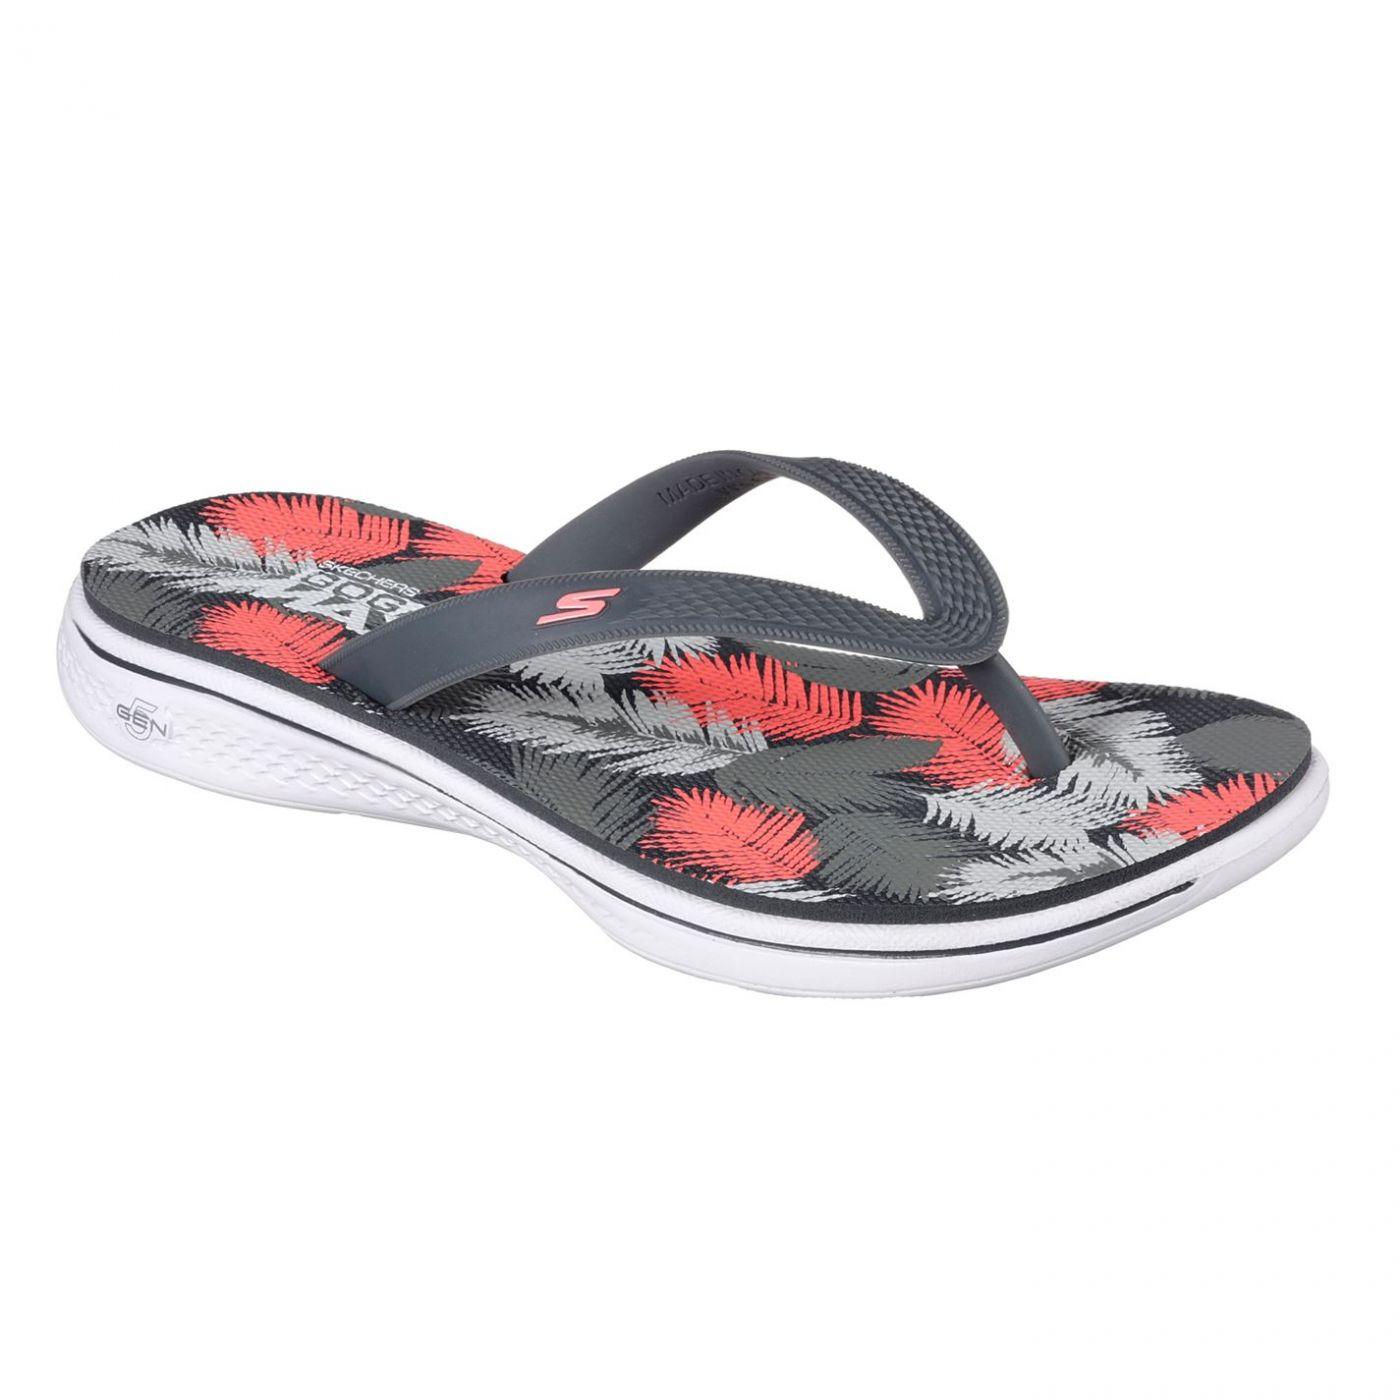 Skechers H2 Goga Lagoon Flip Flops Ladies